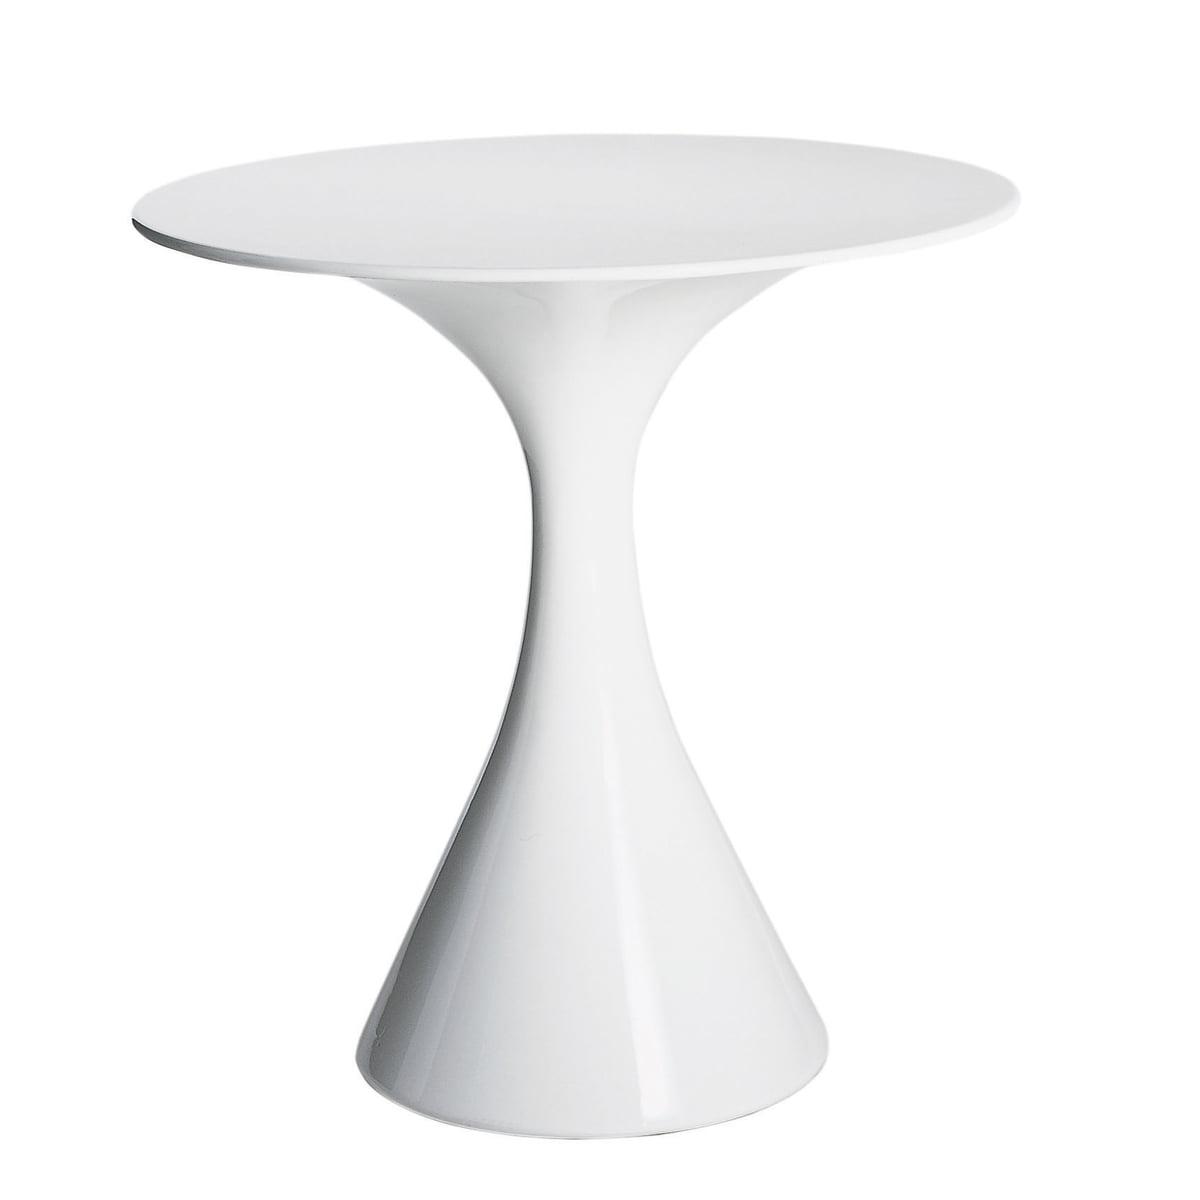 pt home item garden silo table detail lexington tb tables high brands bistro outdoor type items misty